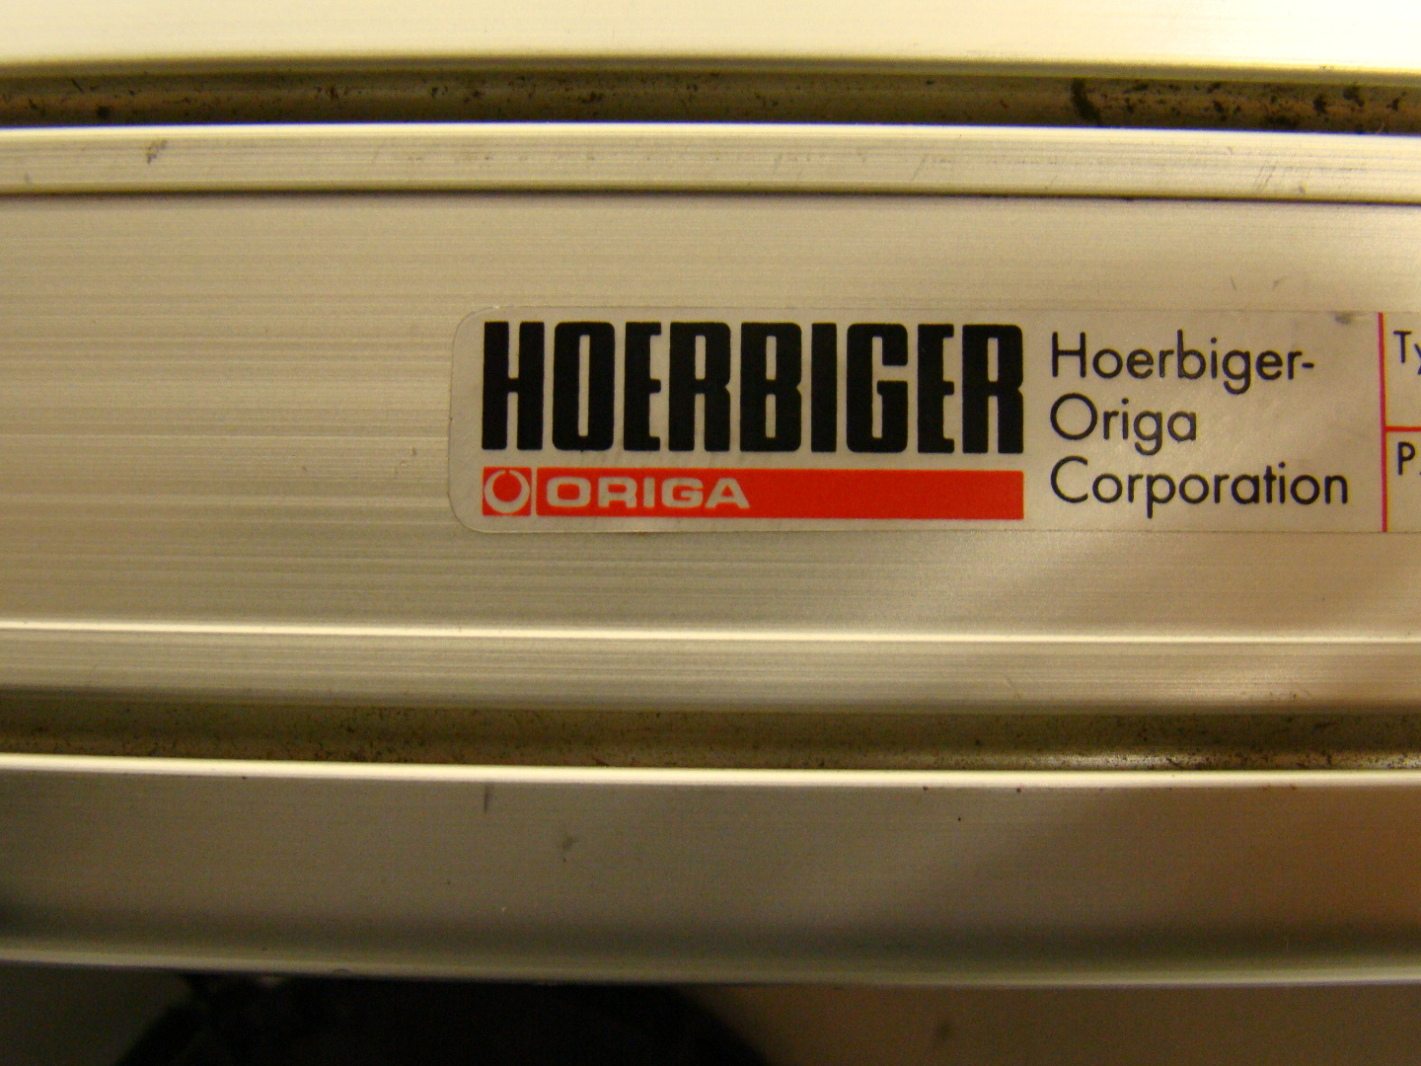 Hoerbiger Origa 120 PSI 40 2020/25X28 BM eBay #B31C03